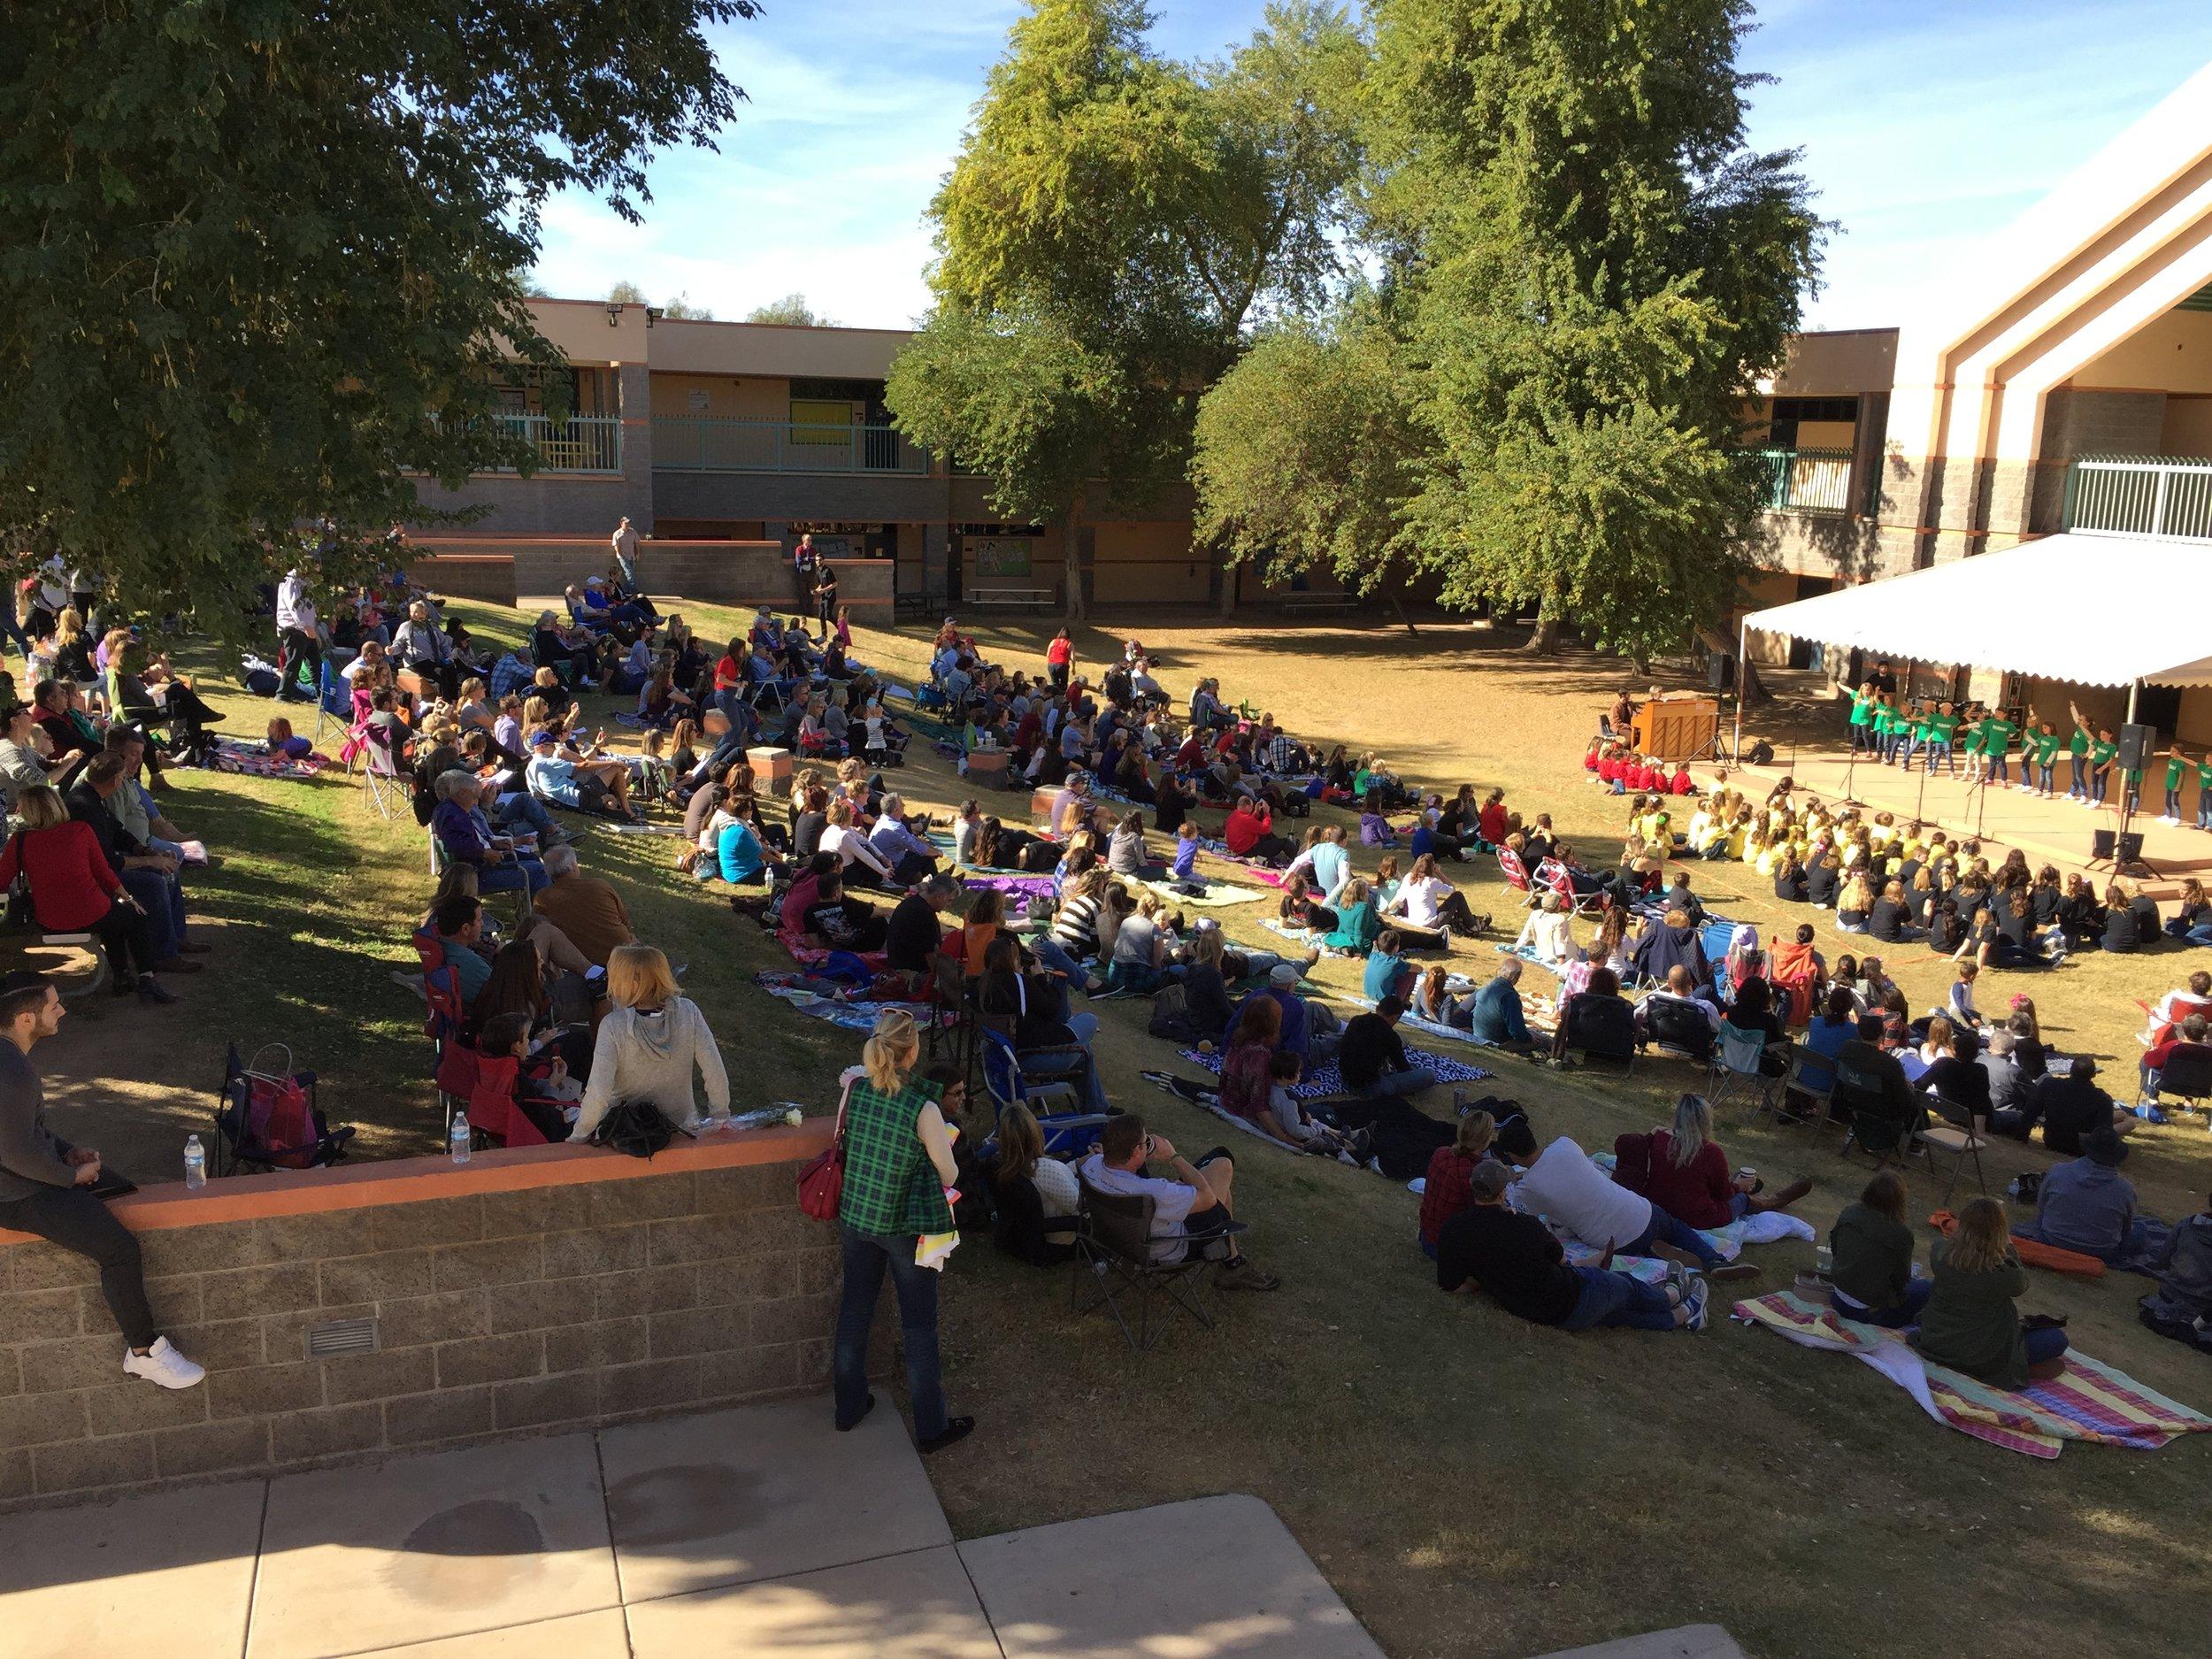 2017 Fall Concert - Redfield Elementary School